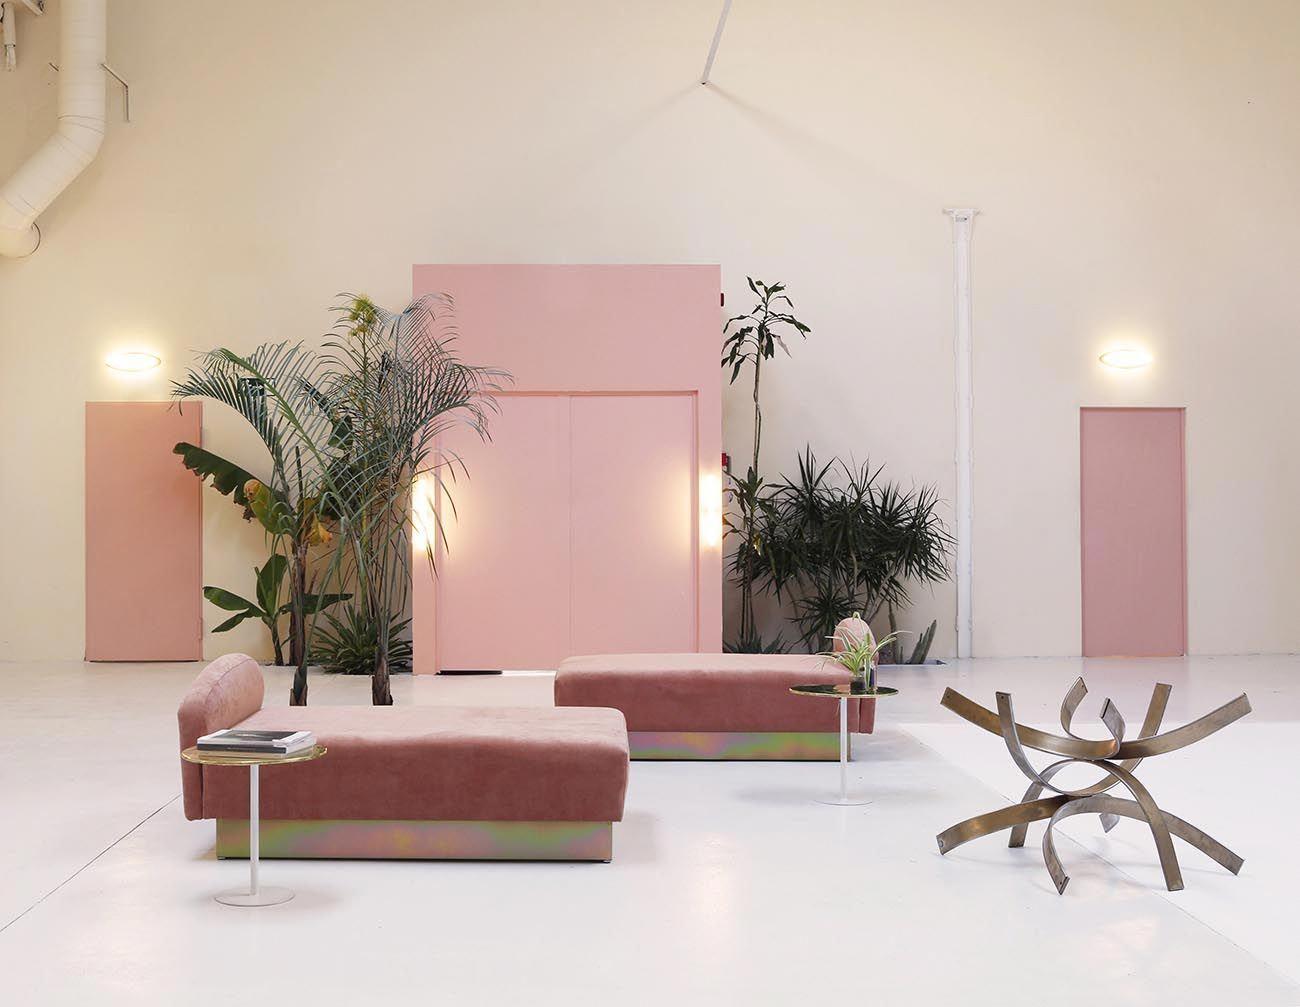 Photo antartica estudio sweet home make interior decoration design ideas decor for living room also rh pinterest